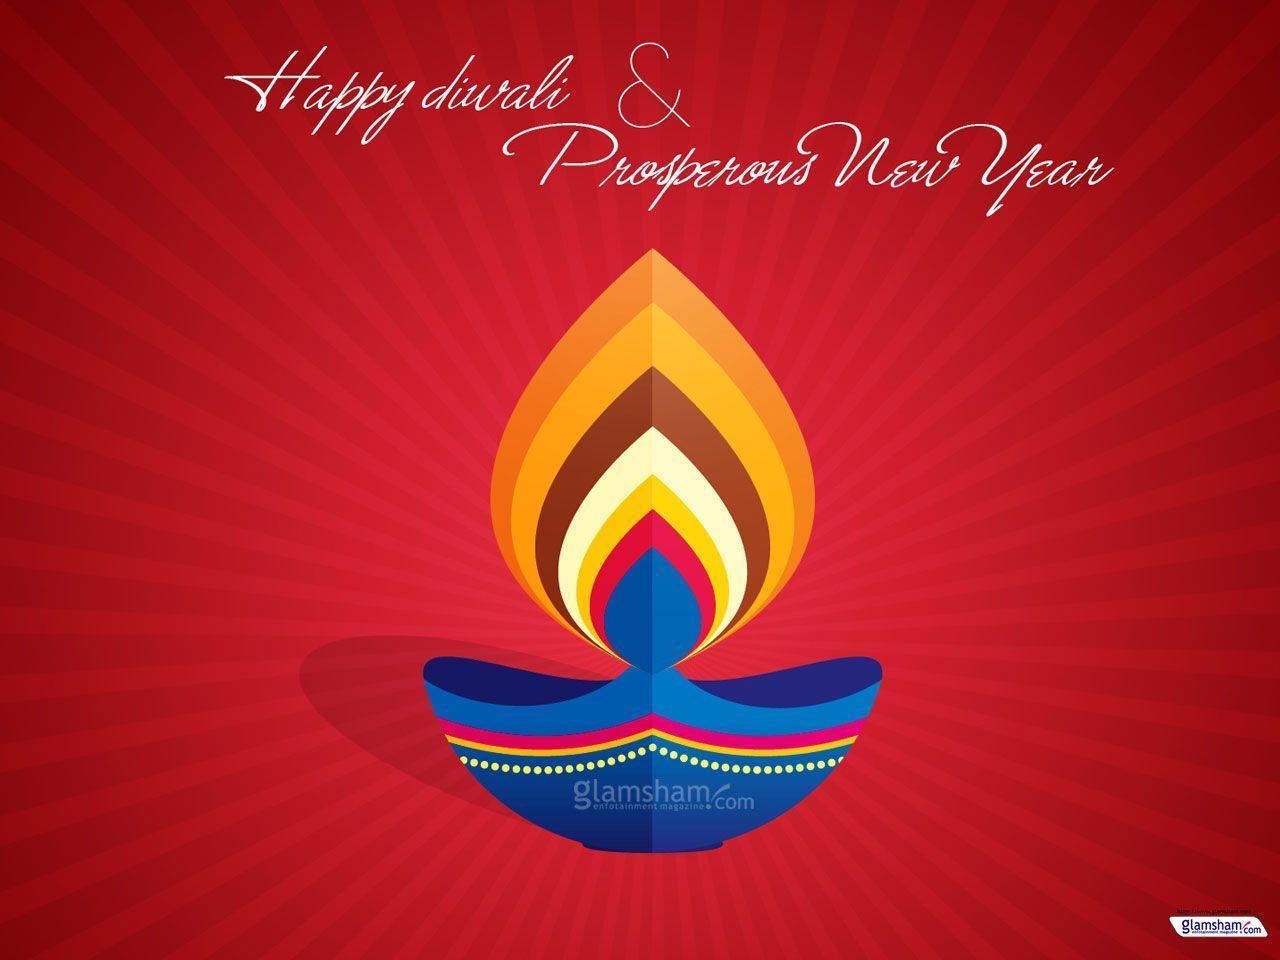 Diwali HD wallpaper 57181 - Glamsham